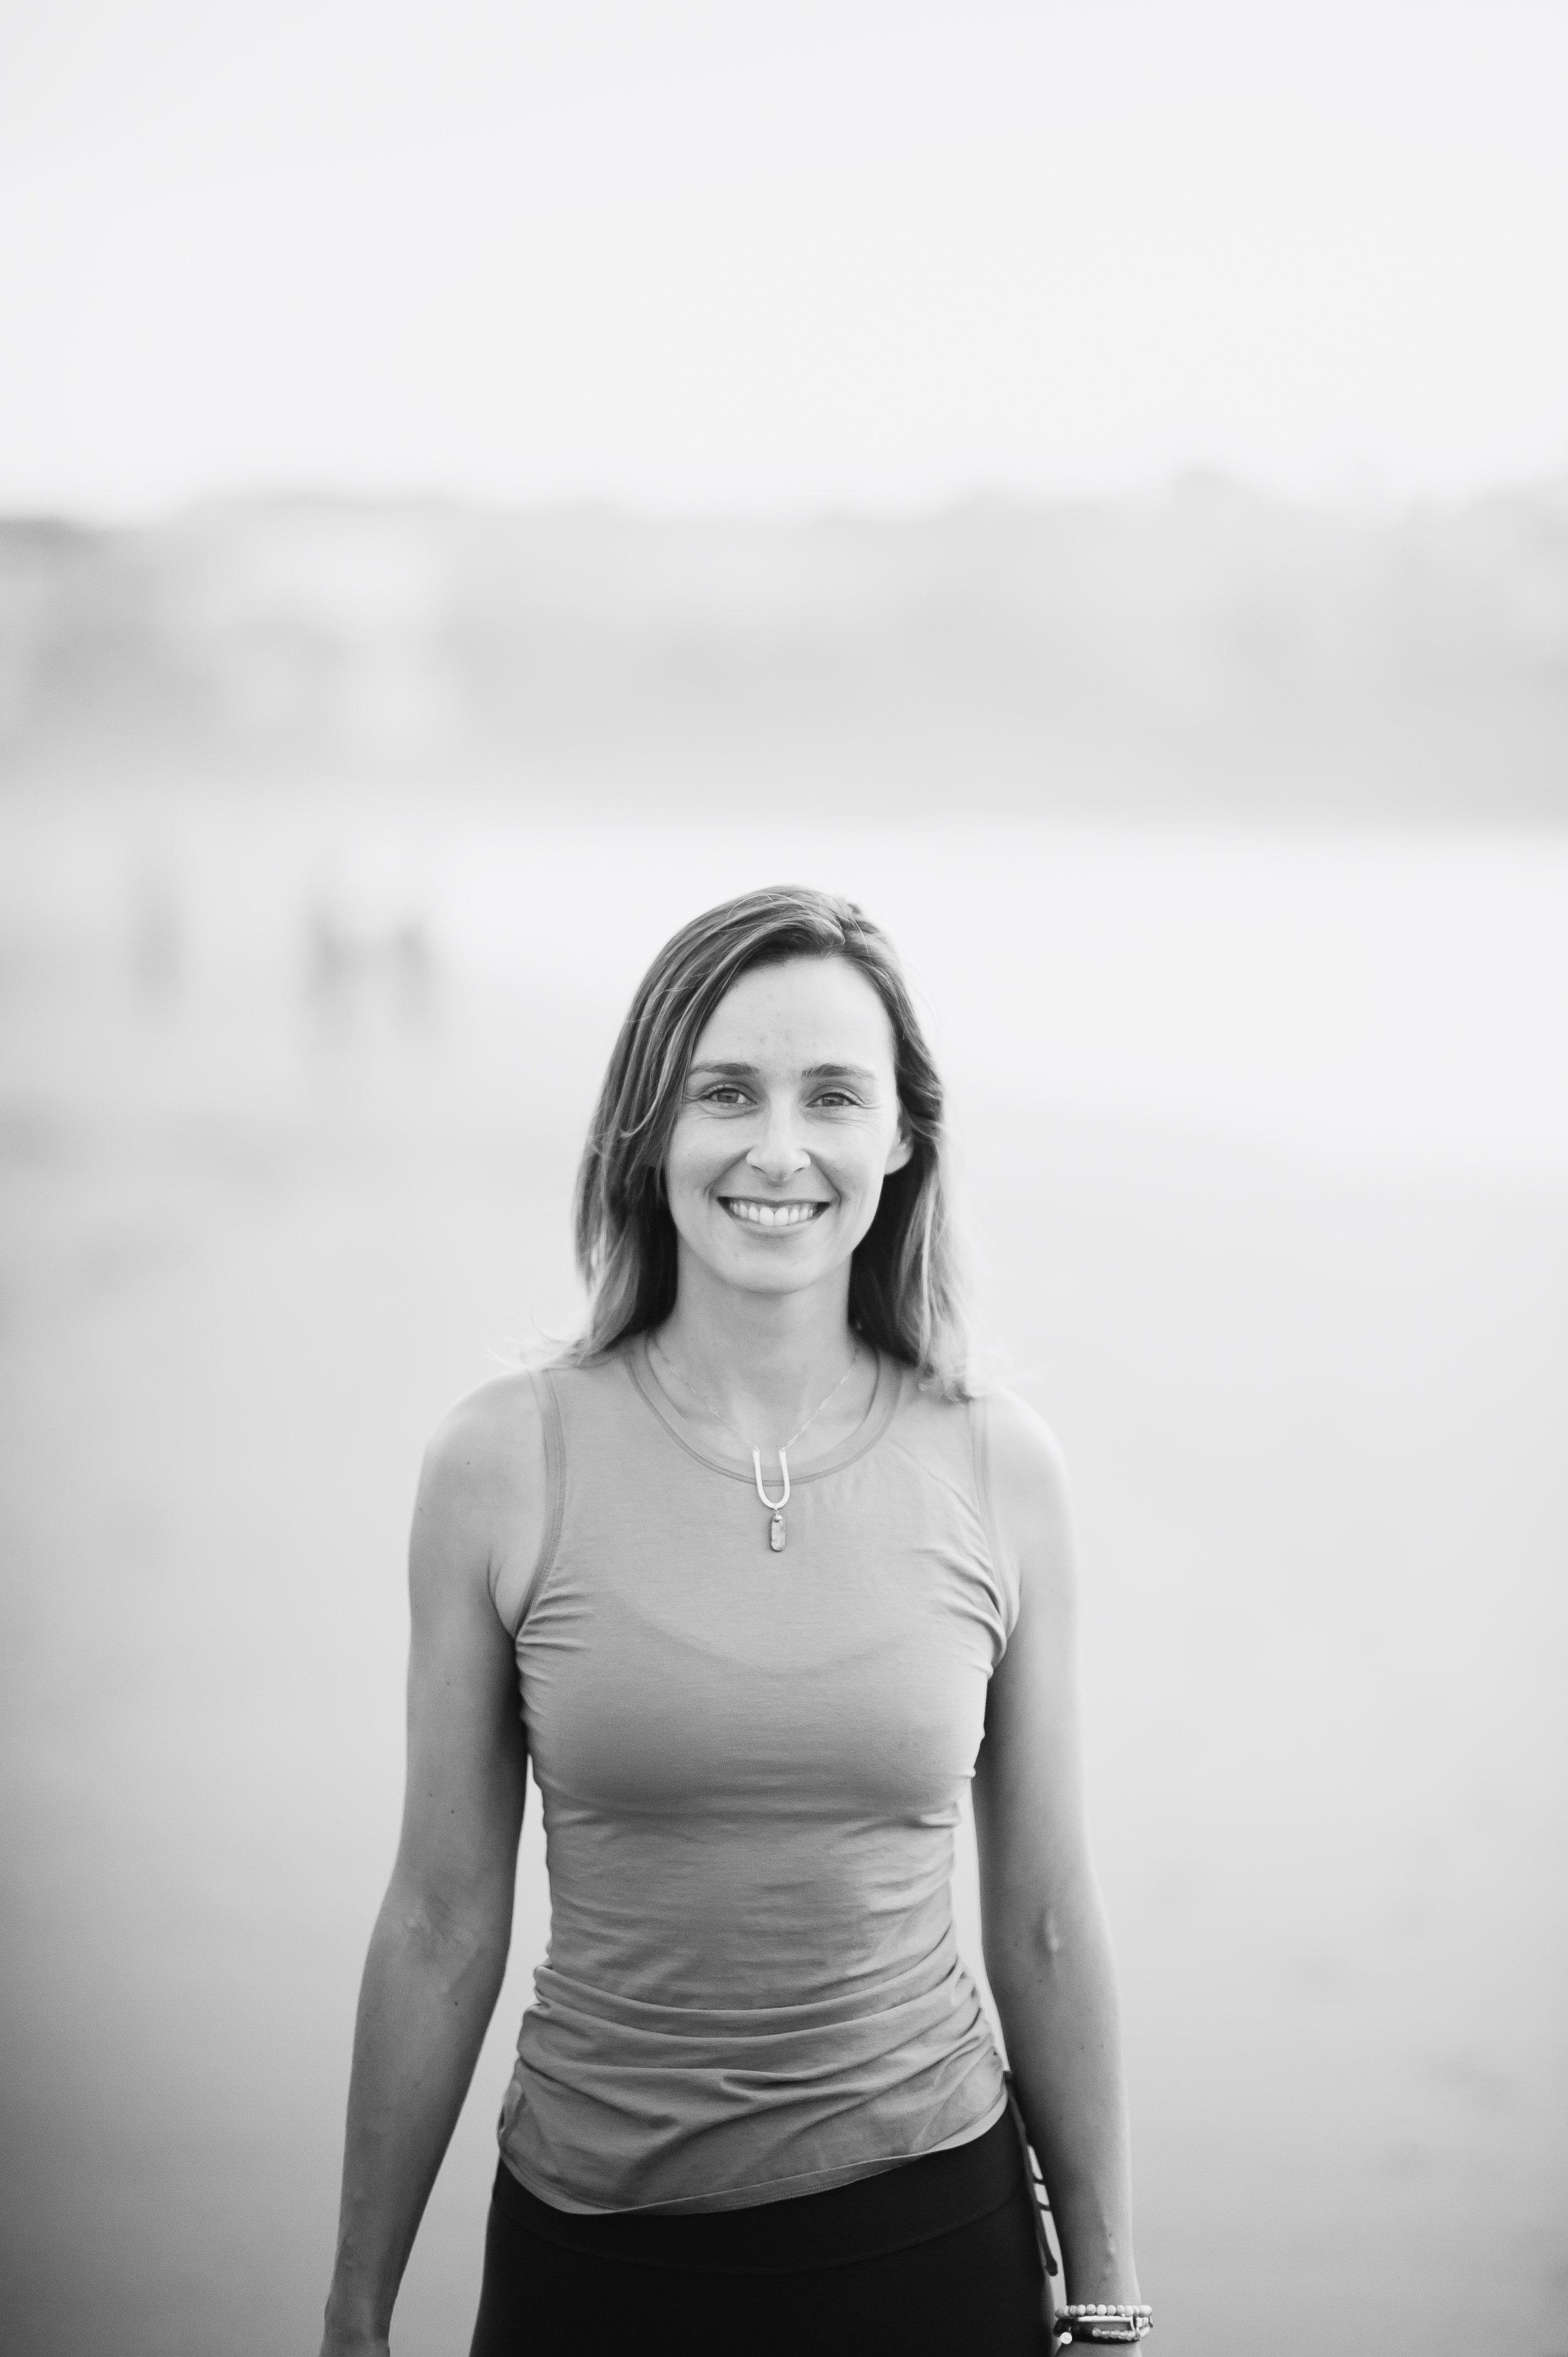 Chloe-Jackman-Photography-Outdoor-Yoga-2017-58.jpg